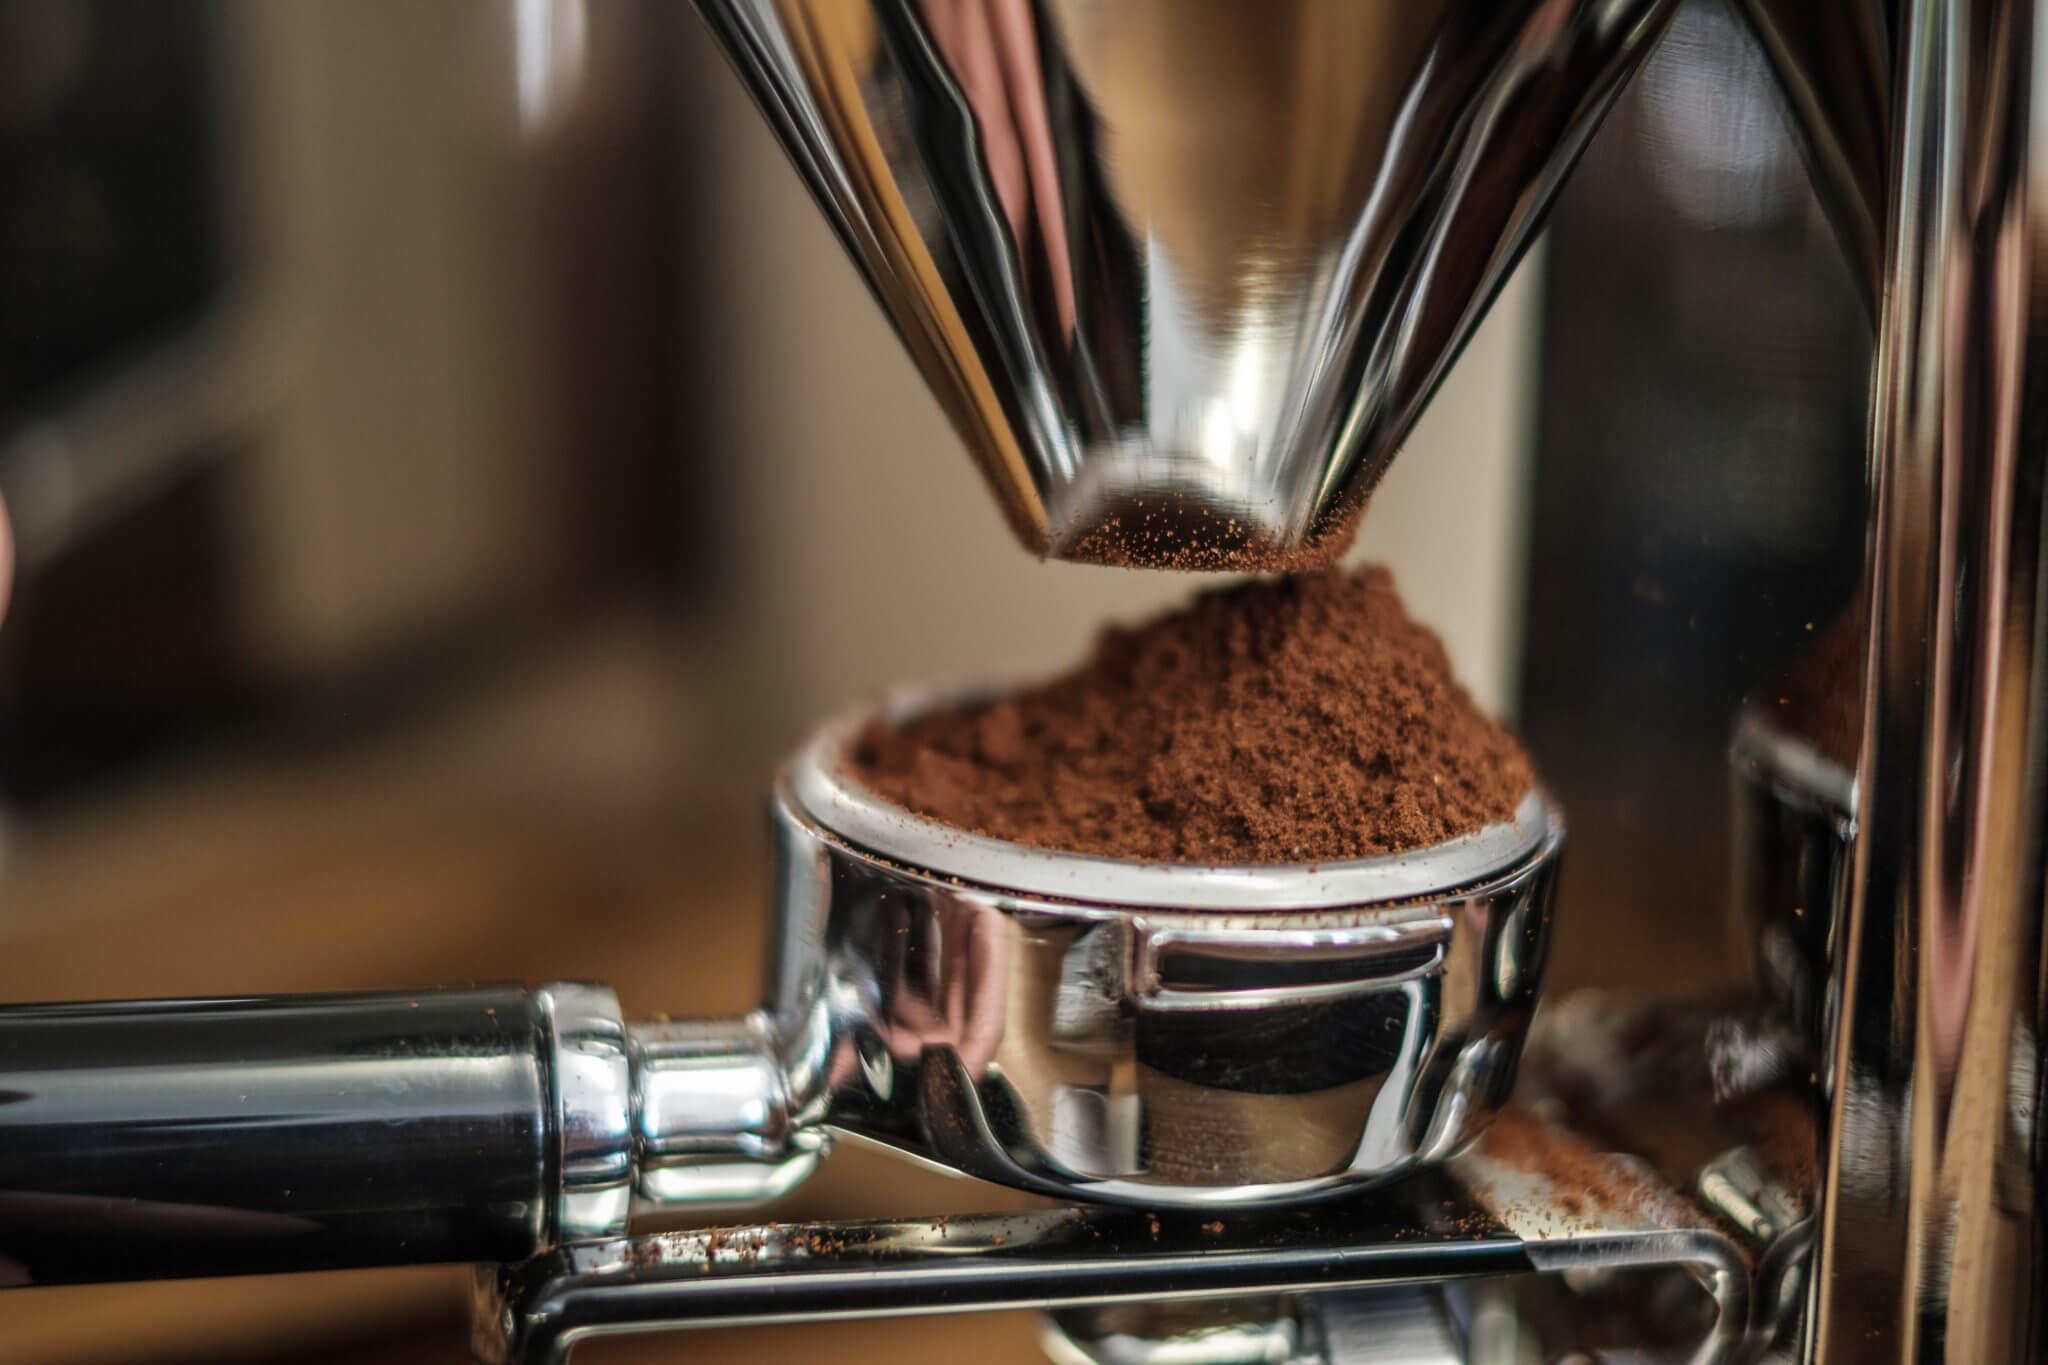 Das Bild zeigt gemahlenen Kaffee, den man im Fahrradgeschäft bike café trinken kann.